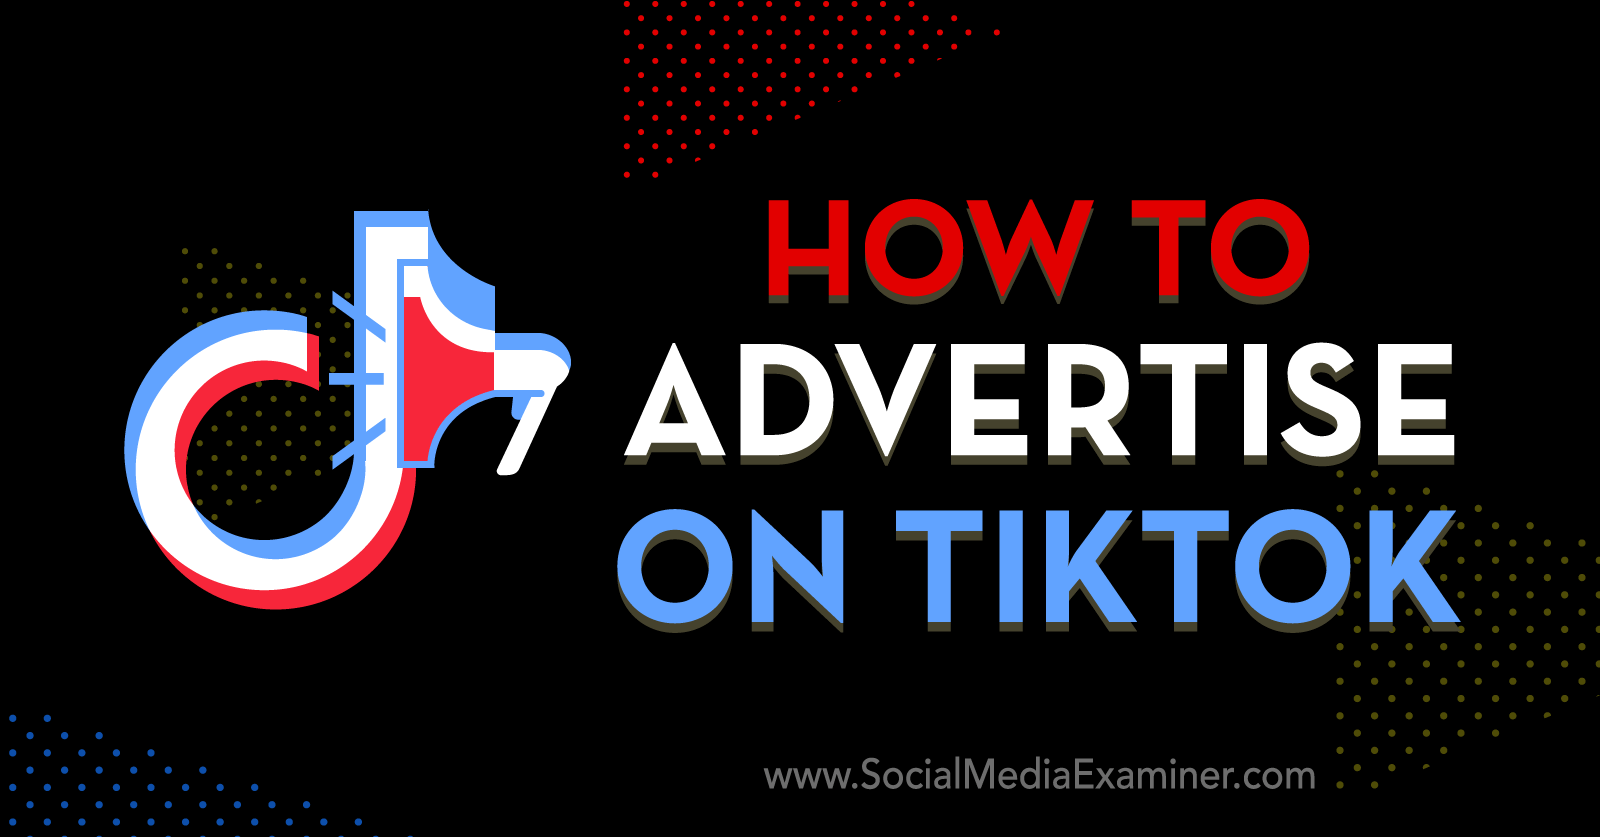 How to Advertise on TikTok : Social Media Examiner